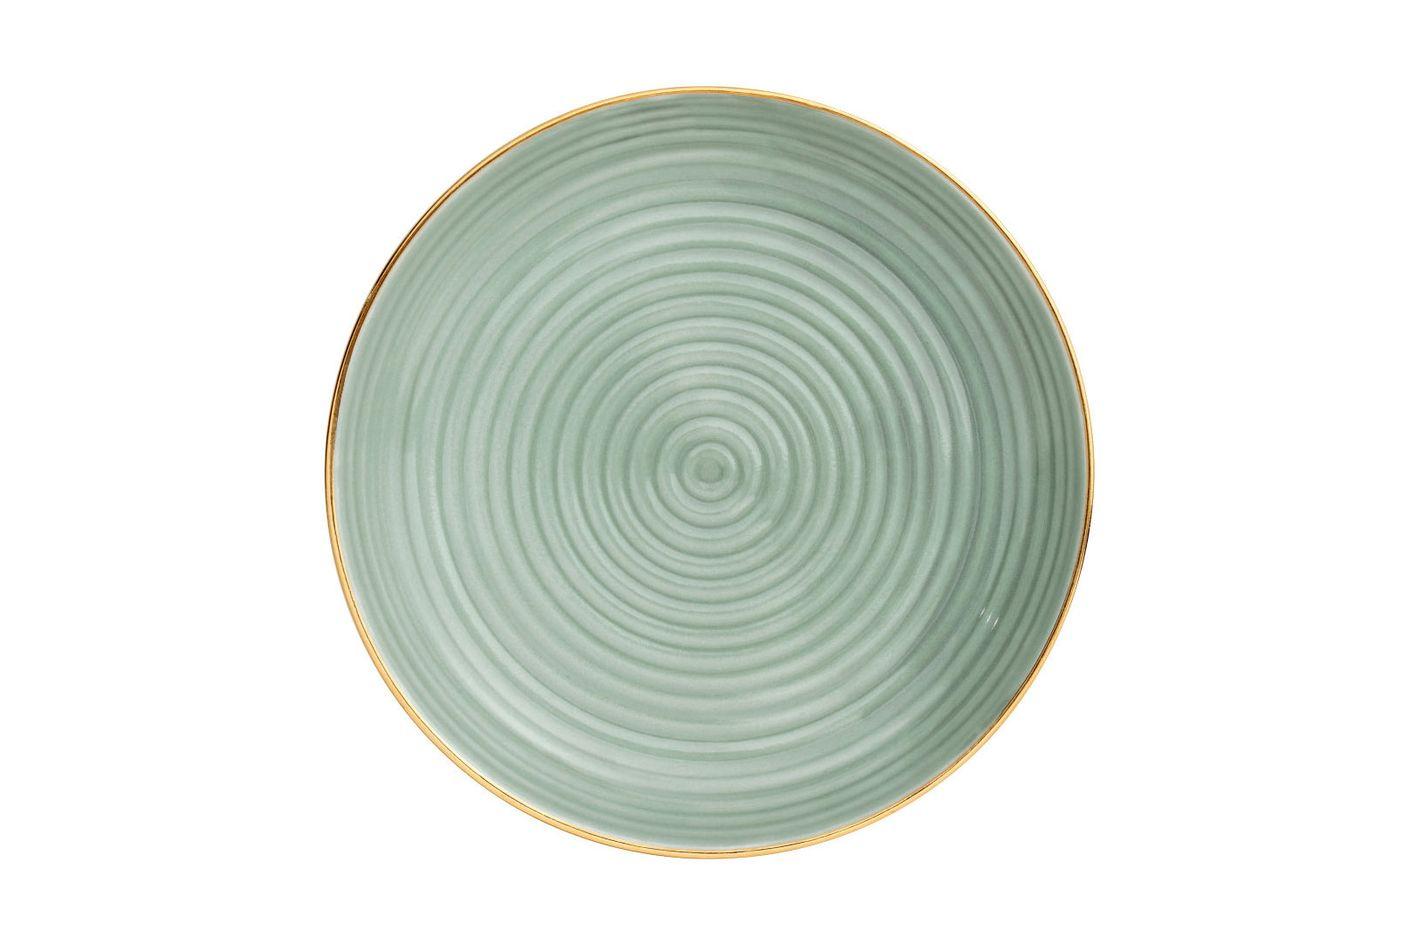 H&M Textured Porcelain Dish